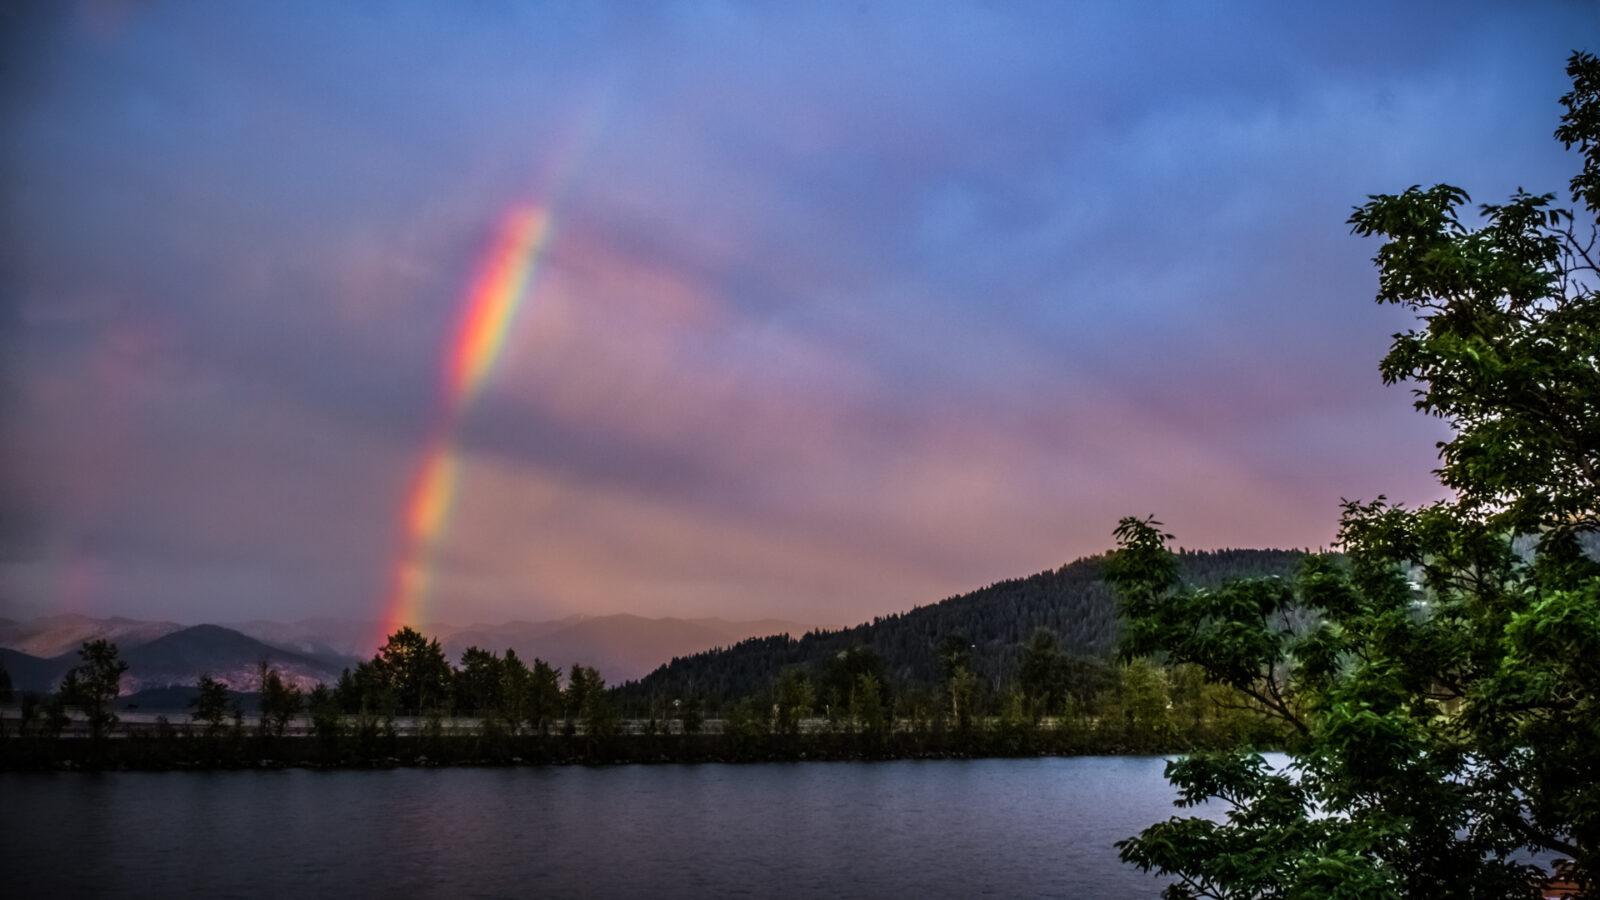 June's Rainbow